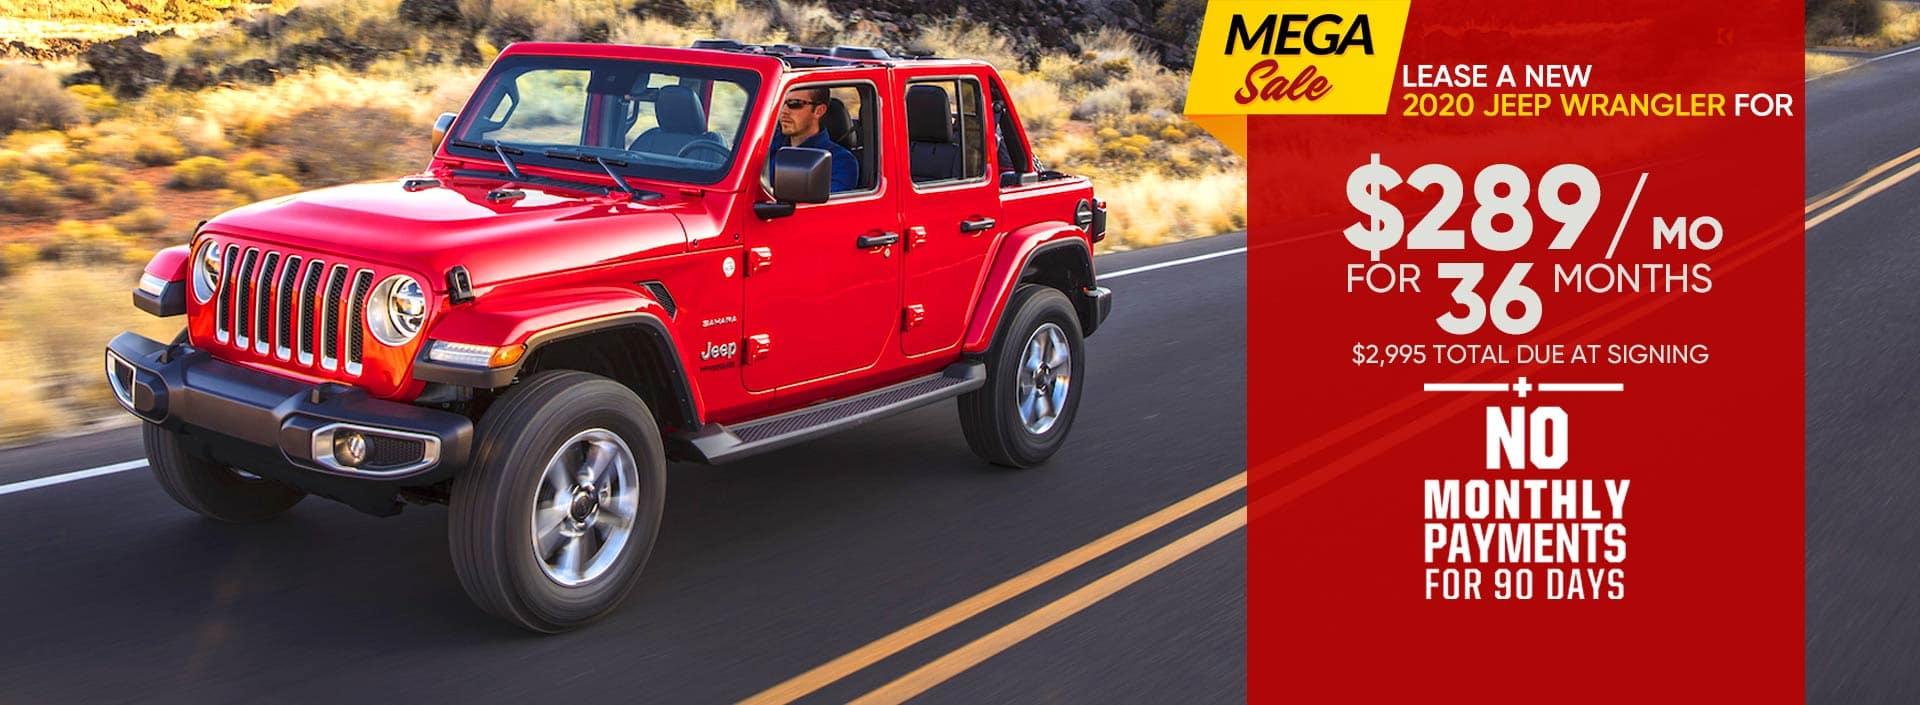 Jeep Wrangler Sale